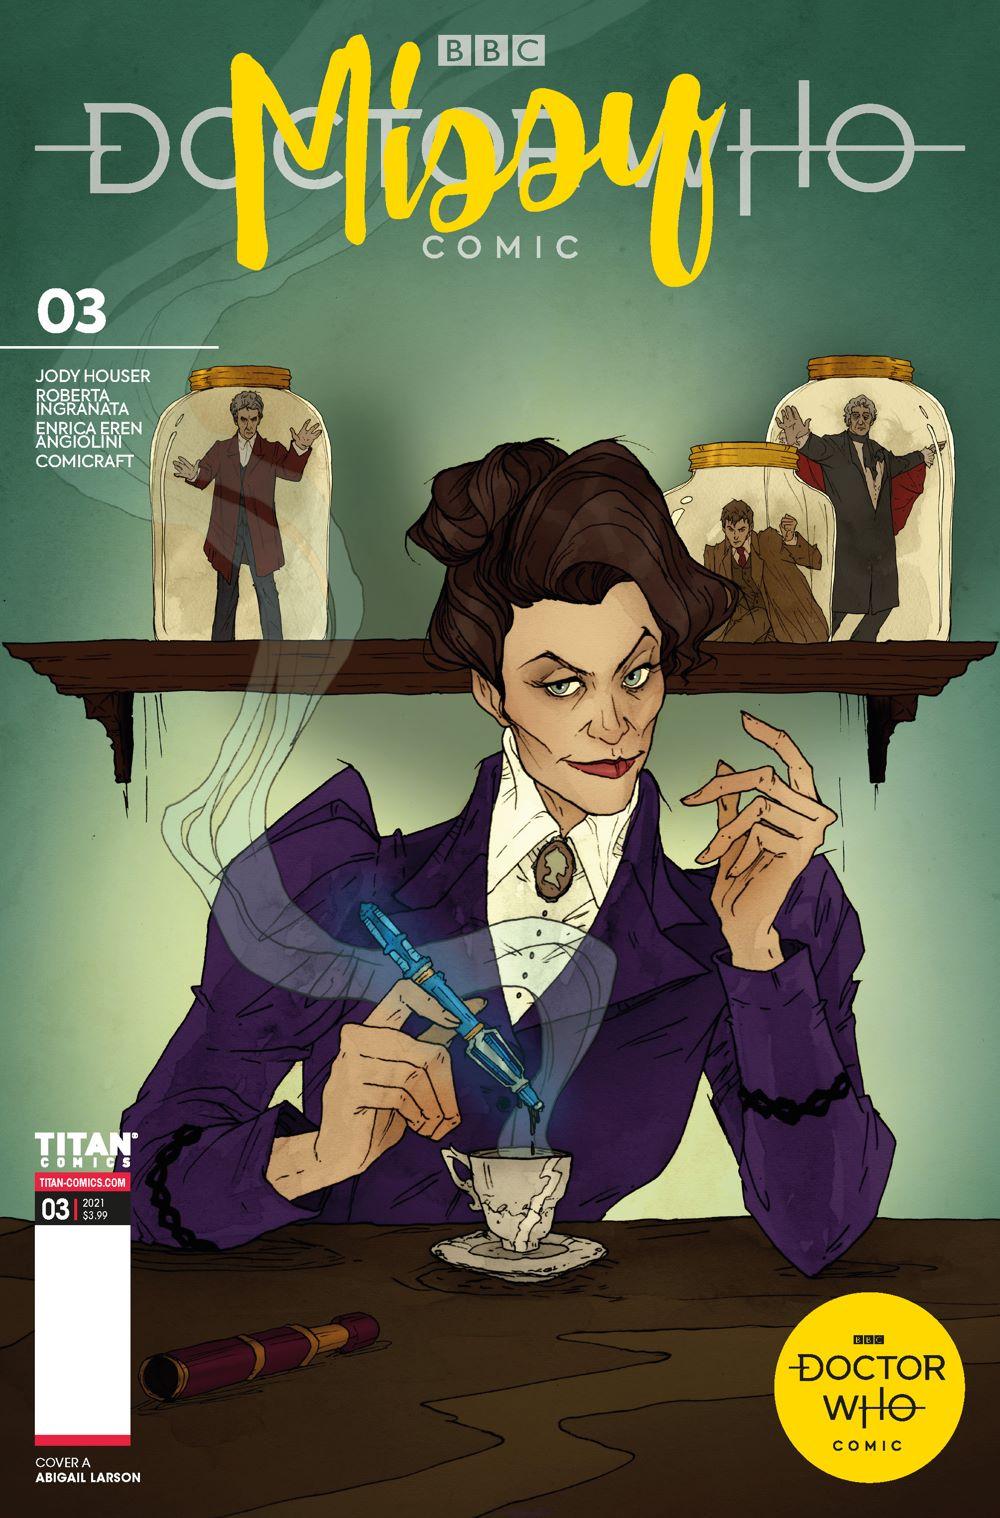 DW_Missy_3_01_COVER_v1al_Page_1-1 ComicList: Titan Comics New Releases for 06/16/2021